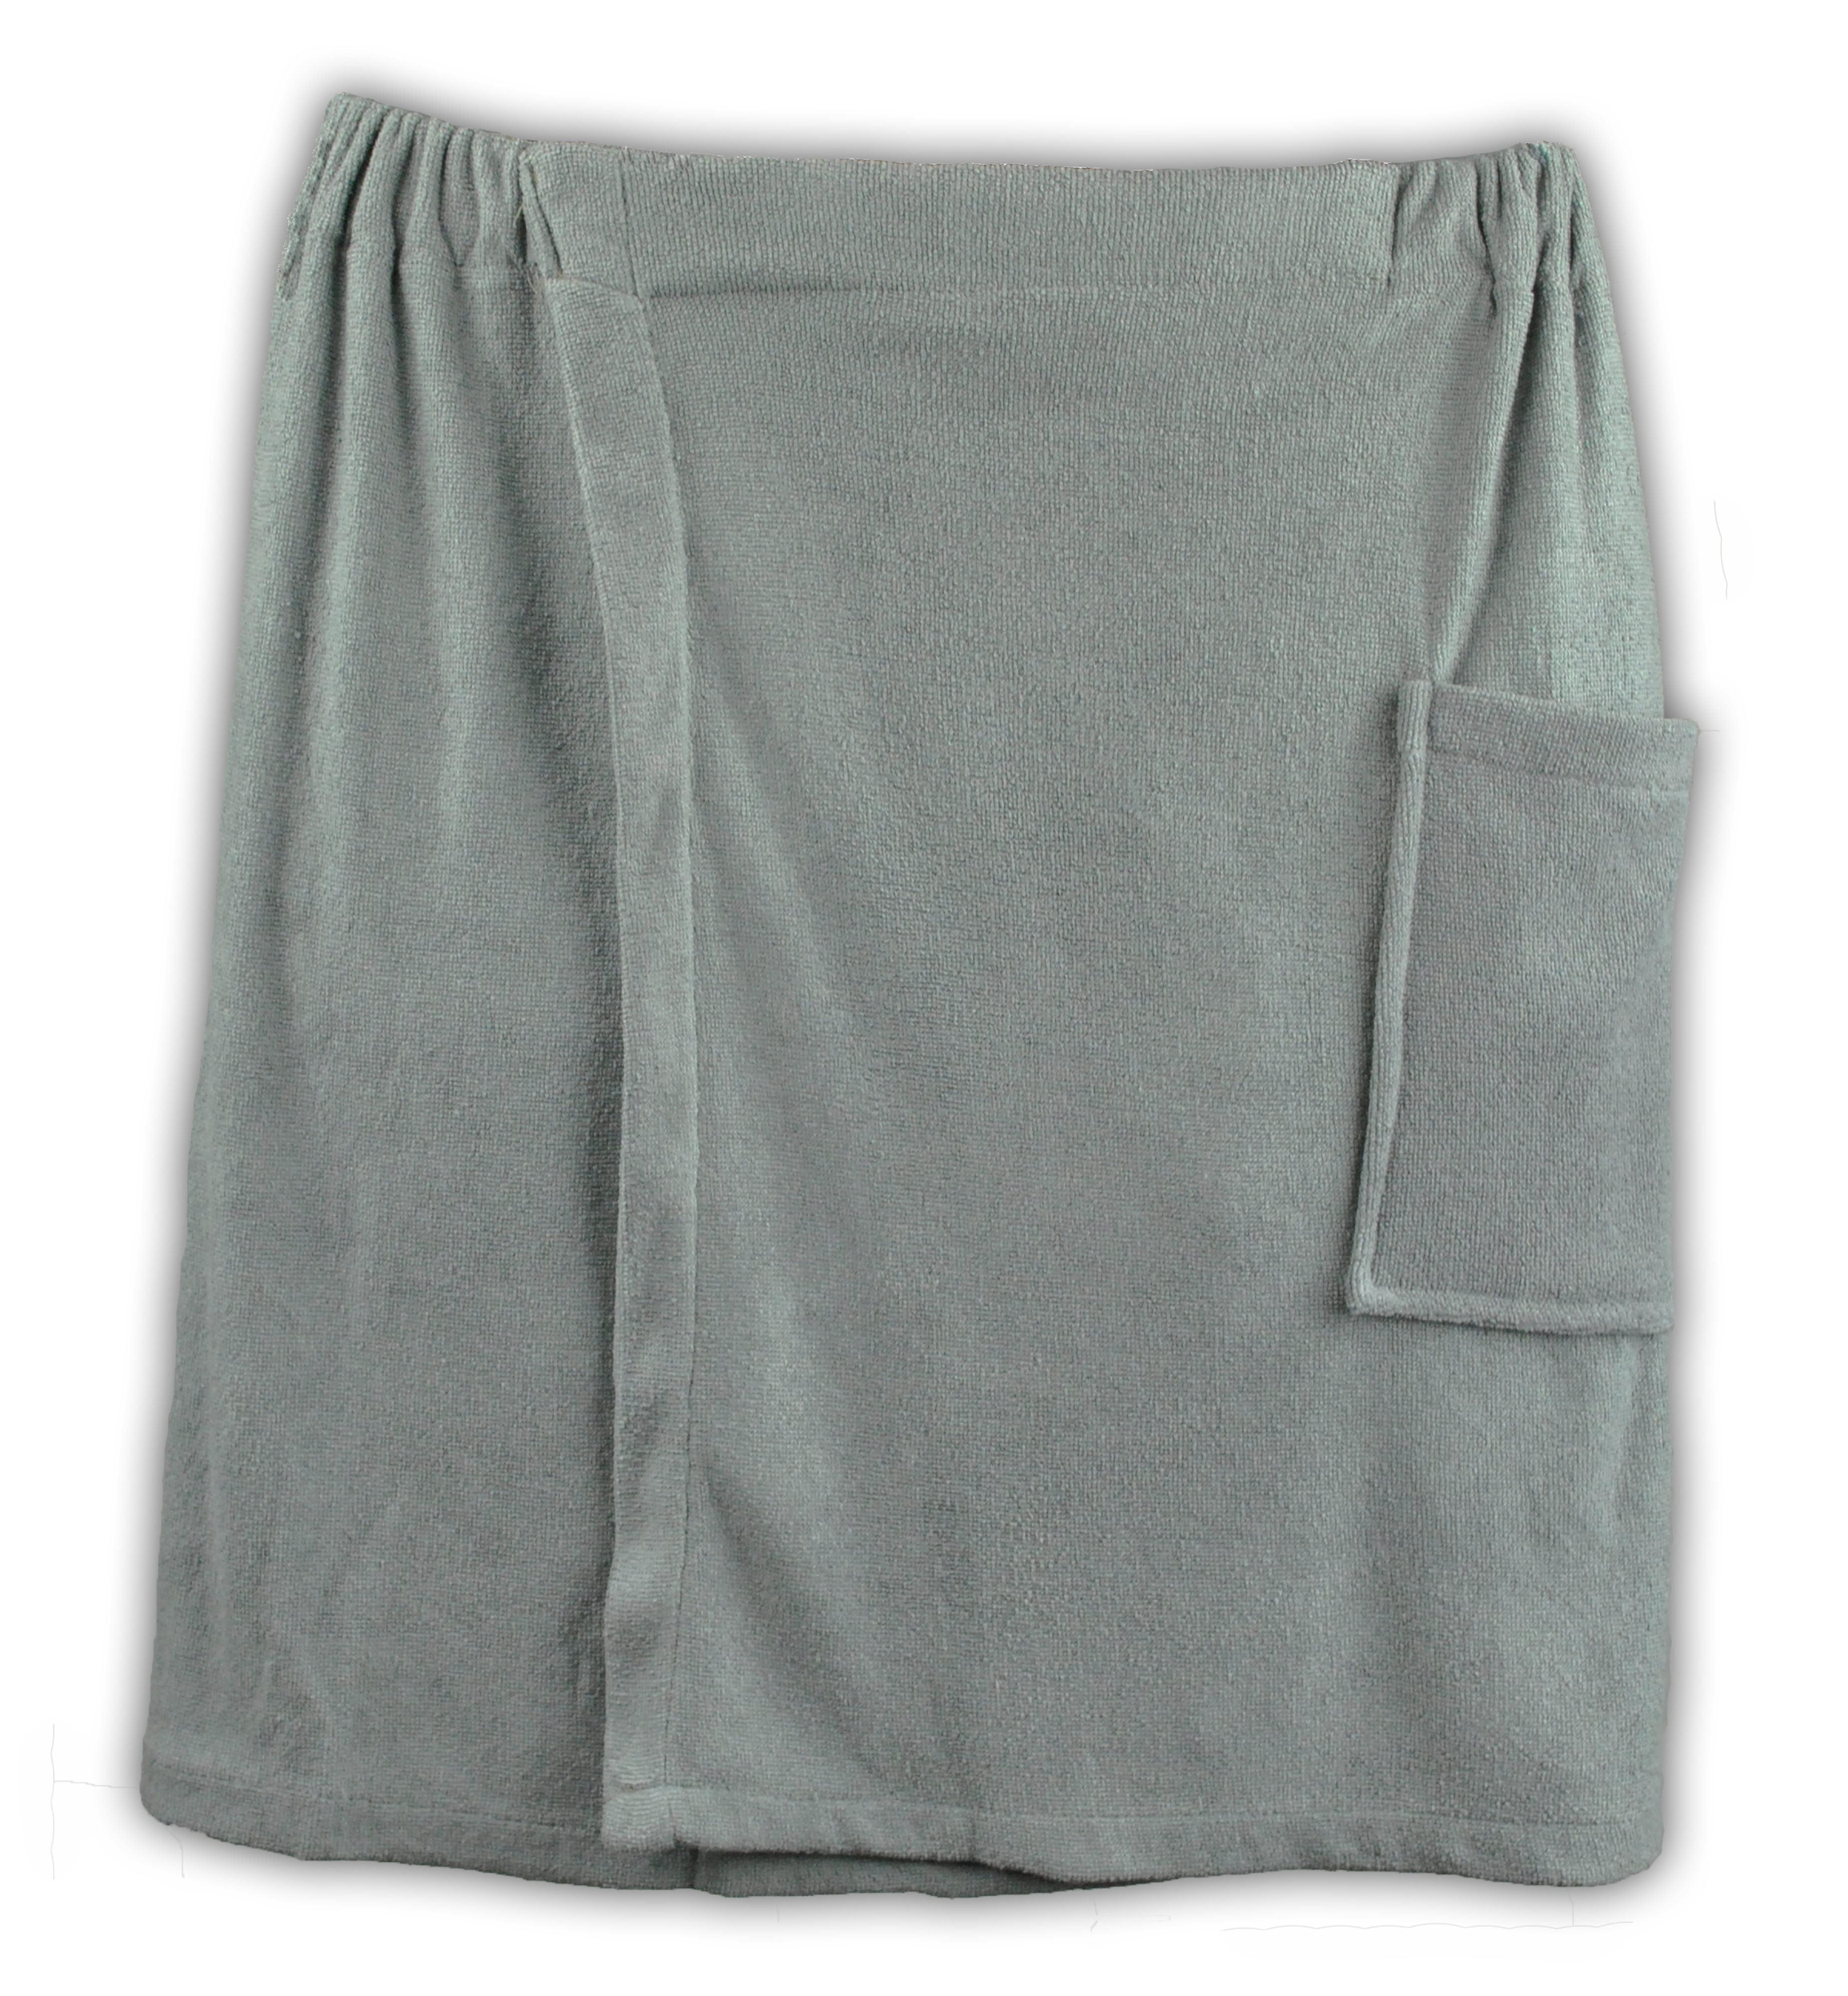 Mens Towel Wrap Spa Bath Sauna Accessory Cotton Shower Cloth Elastic White NEW